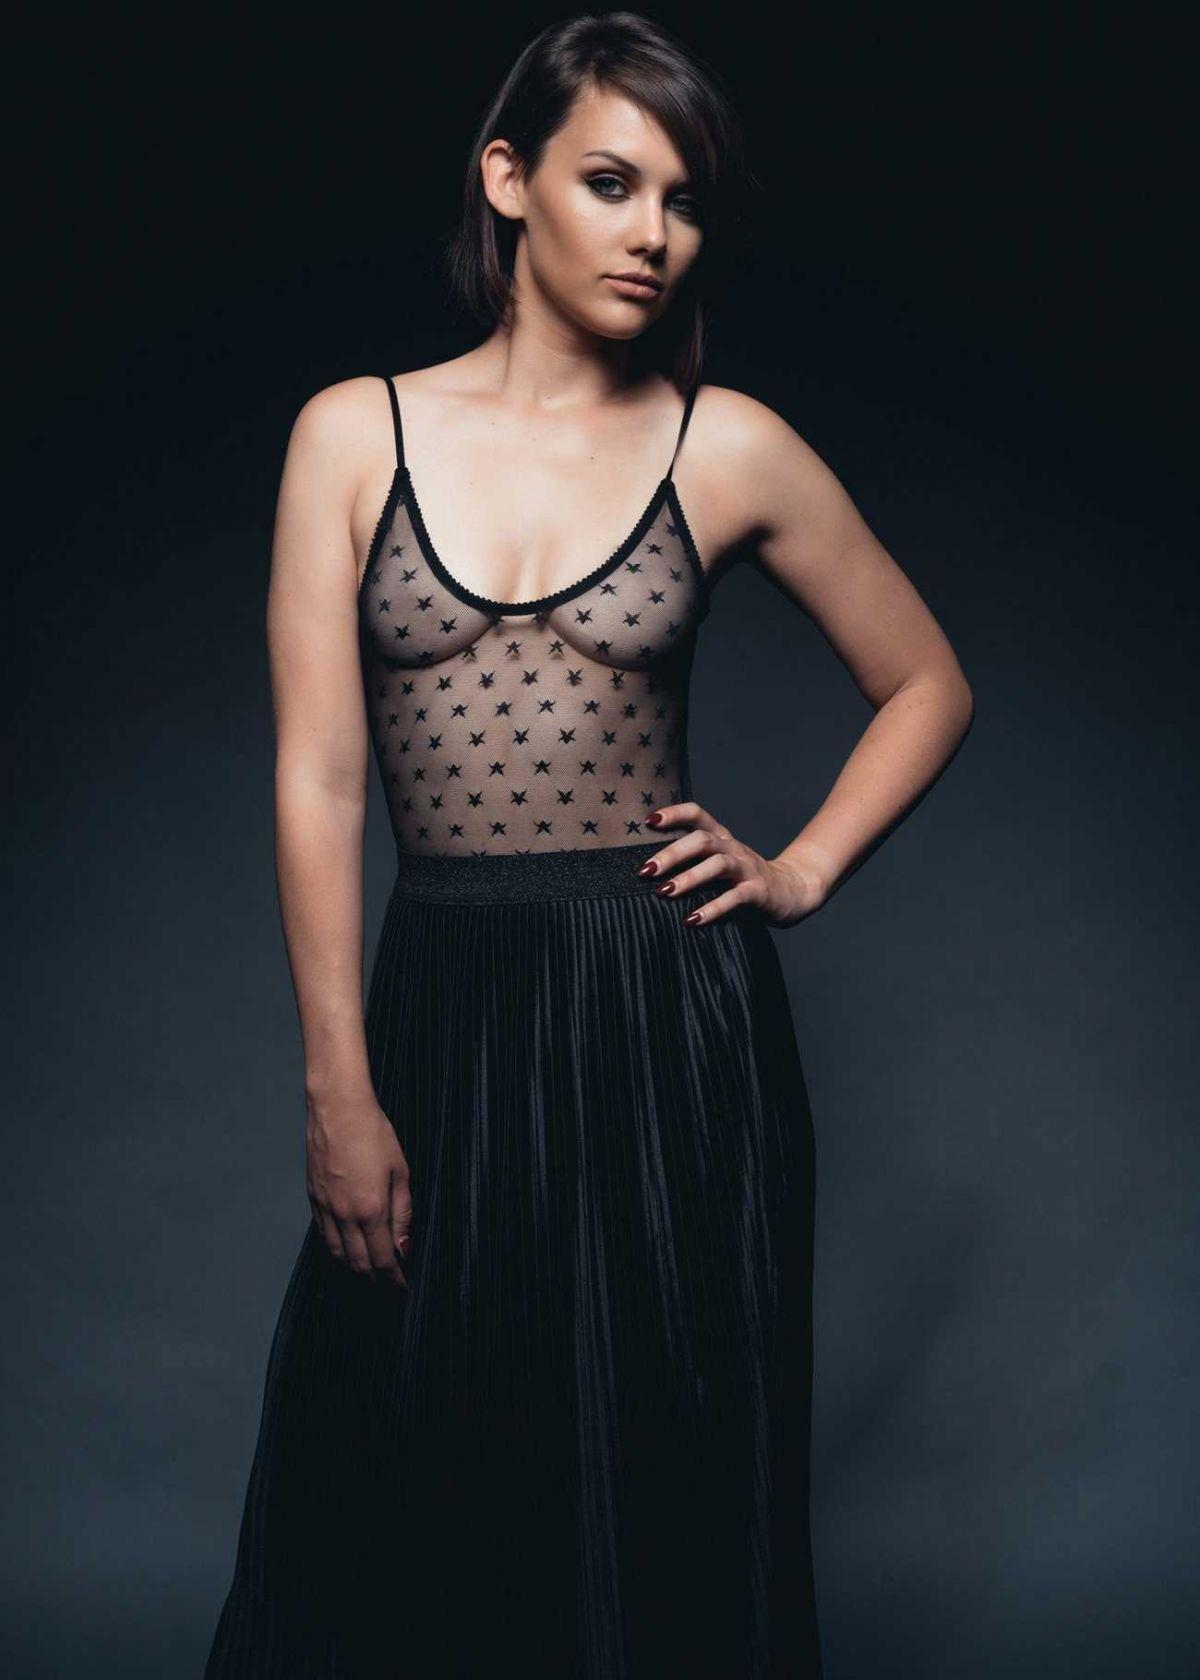 Model Mellisa Clarke nudes (61 pics) Topless, 2020, swimsuit